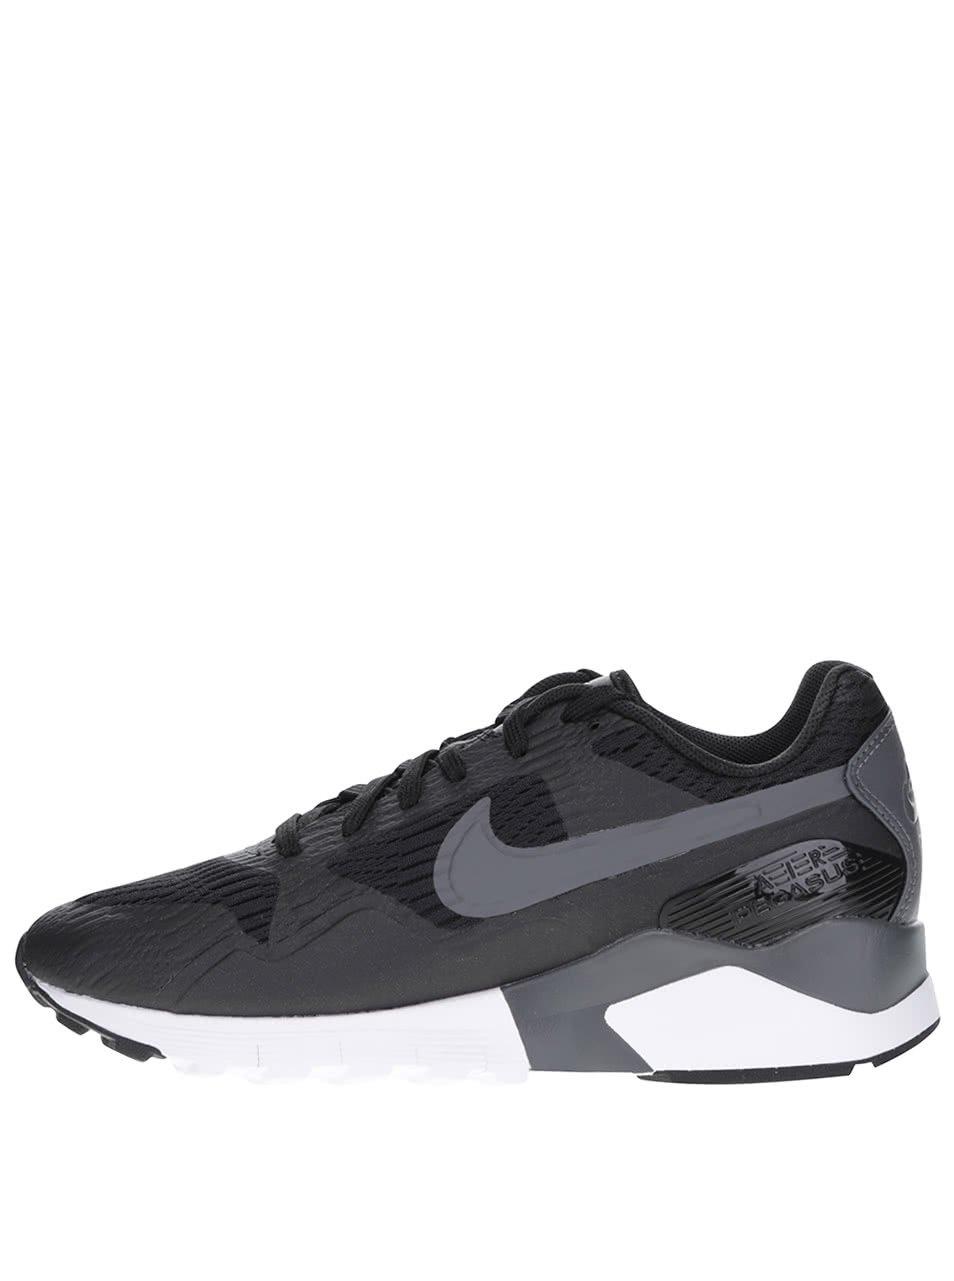 Černé dámské tenisky s detaily Nike Air Pegasus 92/16